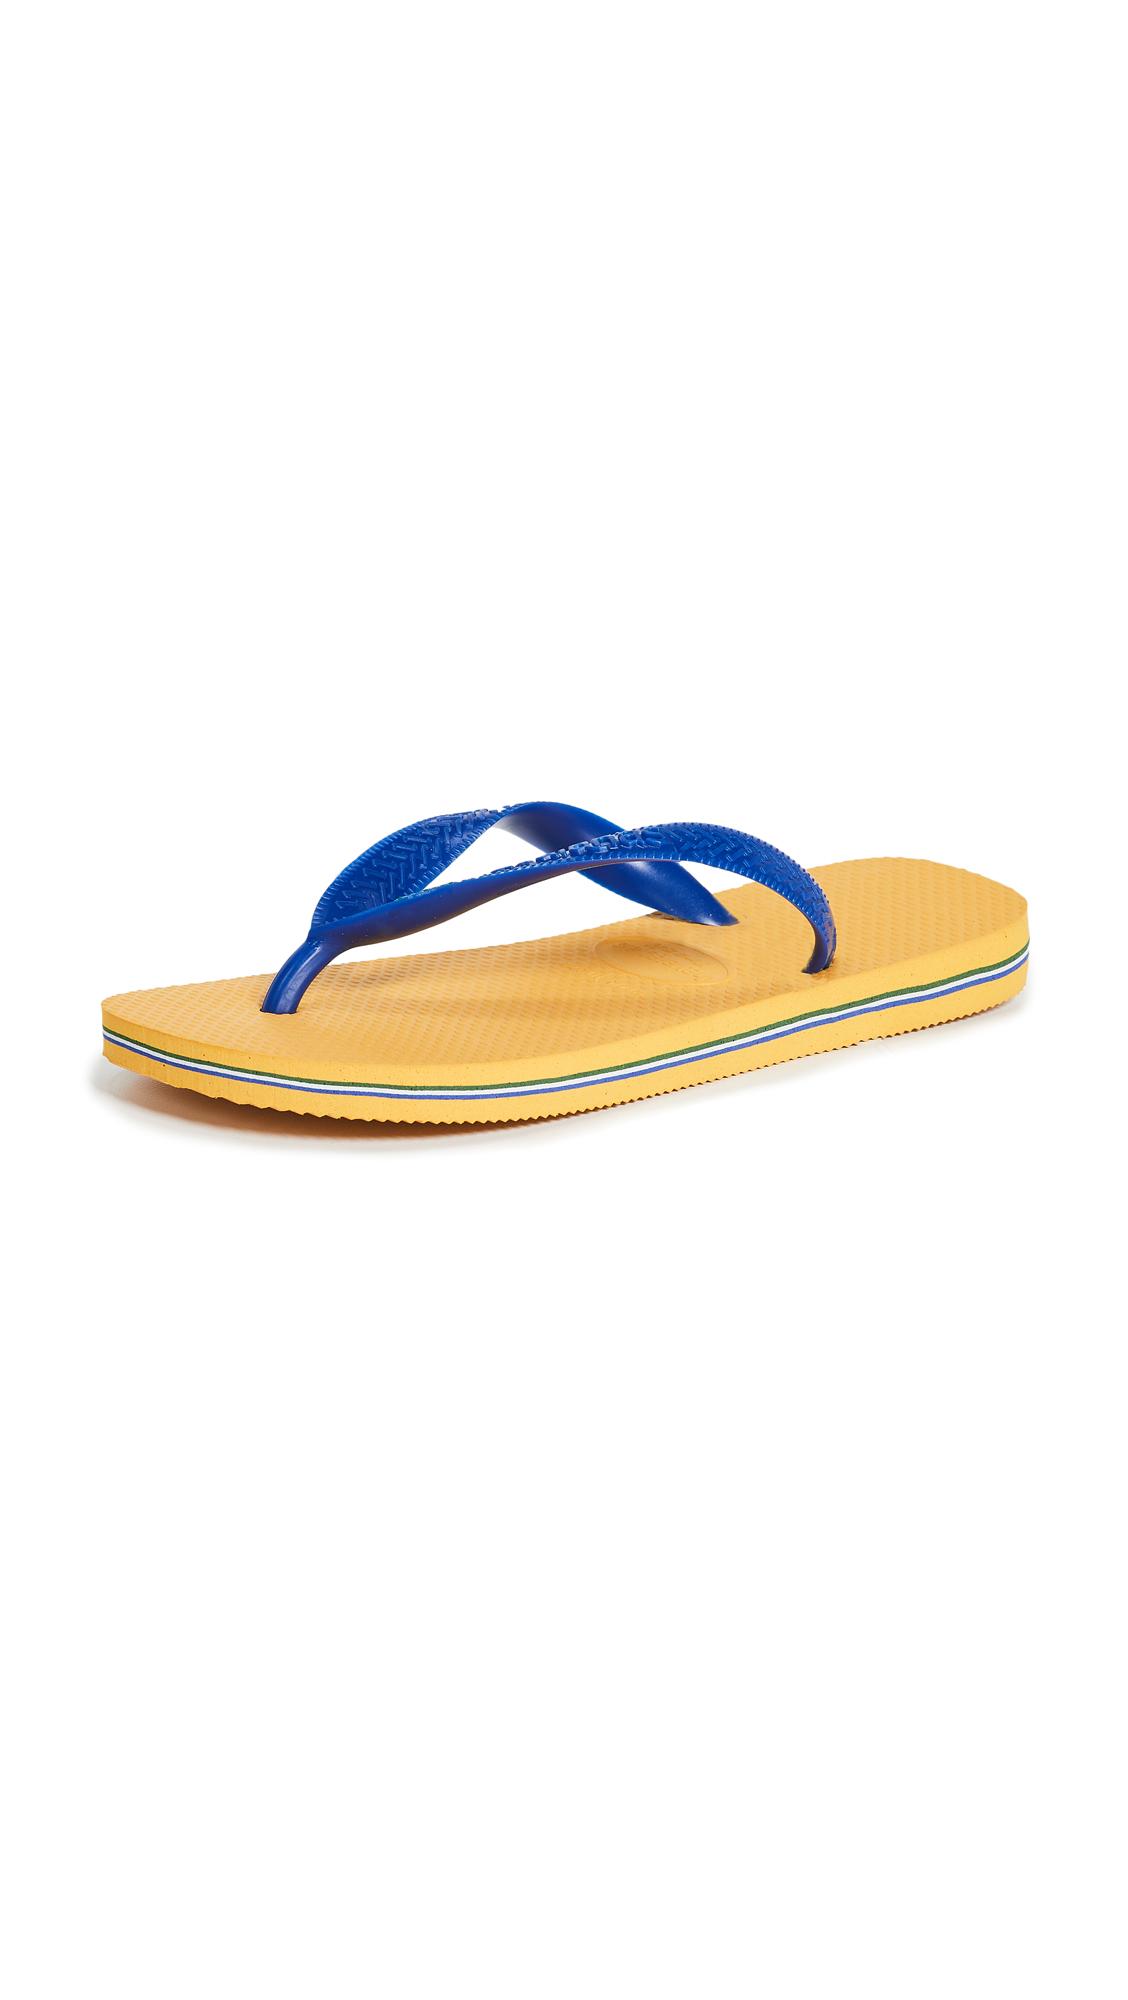 Havaianas Brazil Flip Flops - Banana Yellow